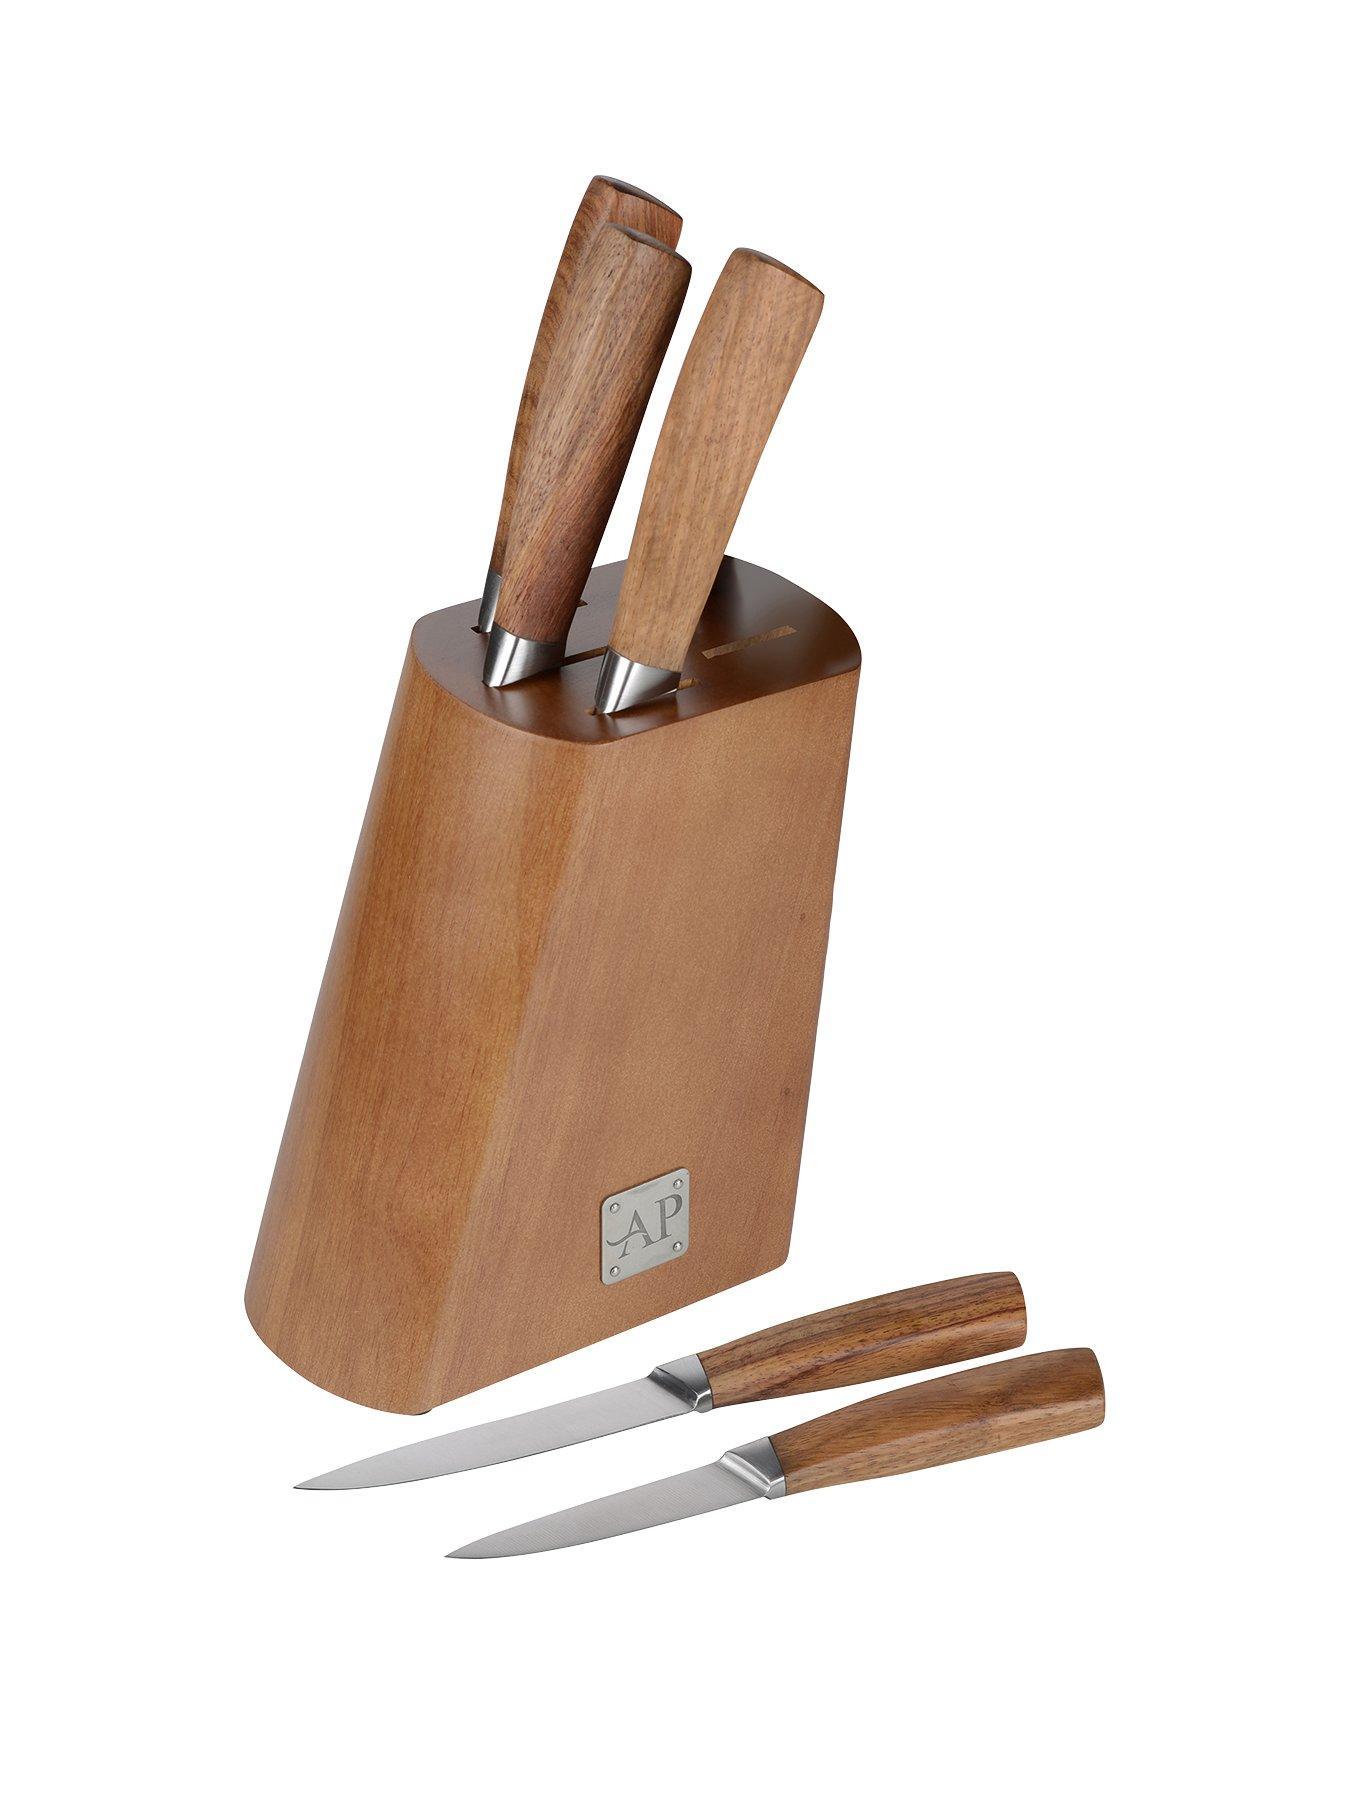 Arthur Price 5-Piece Knife Block Set (Wood)